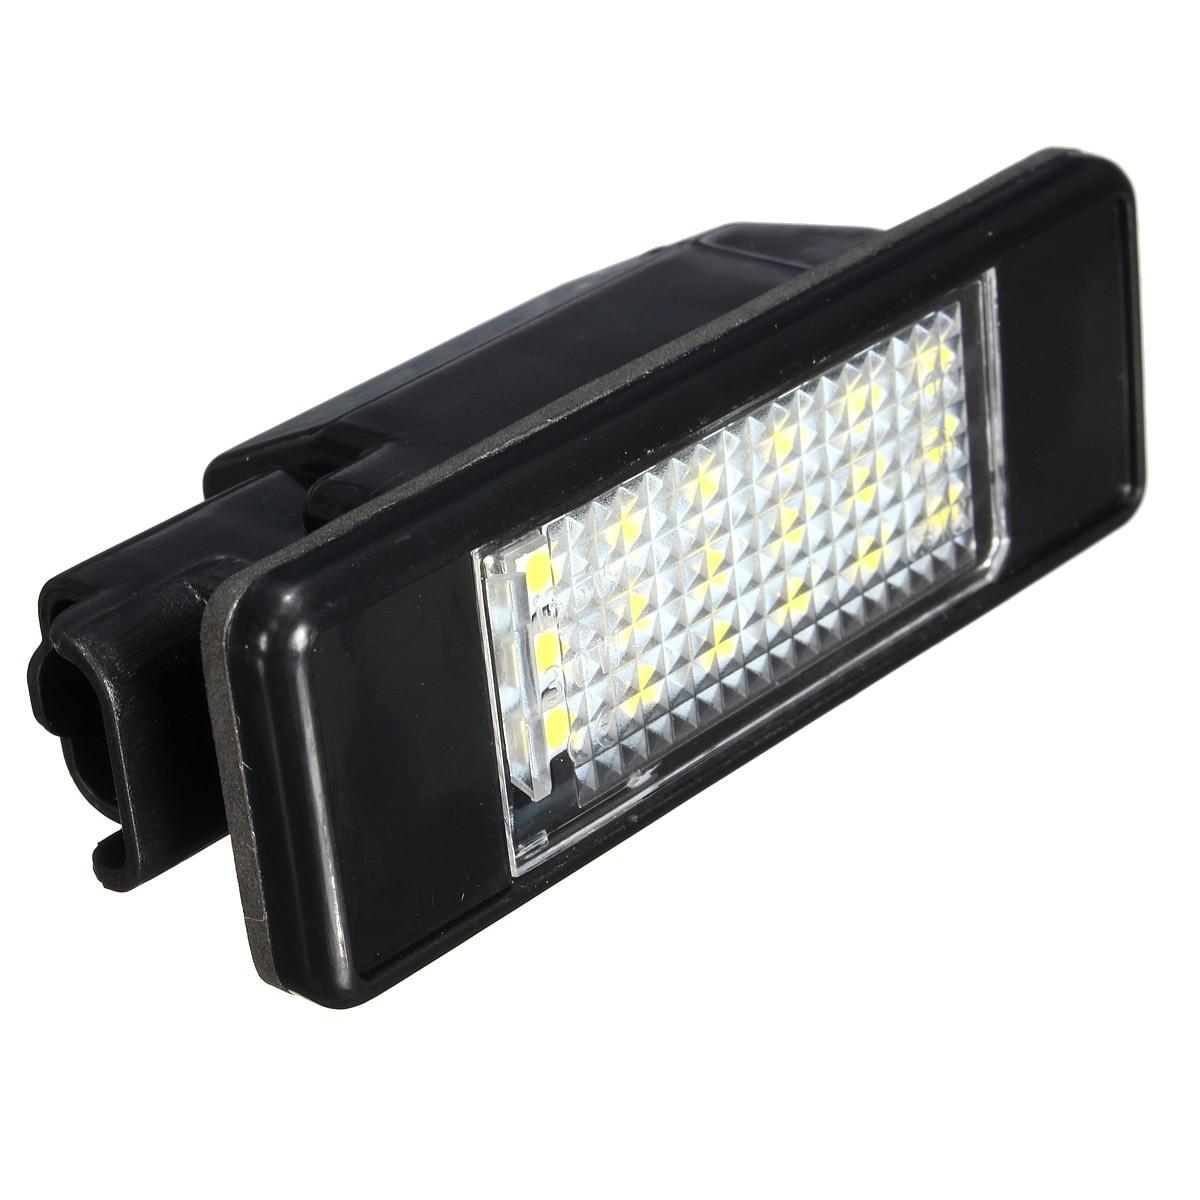 peugeot 207 lights reviews - online shopping peugeot 207 lights